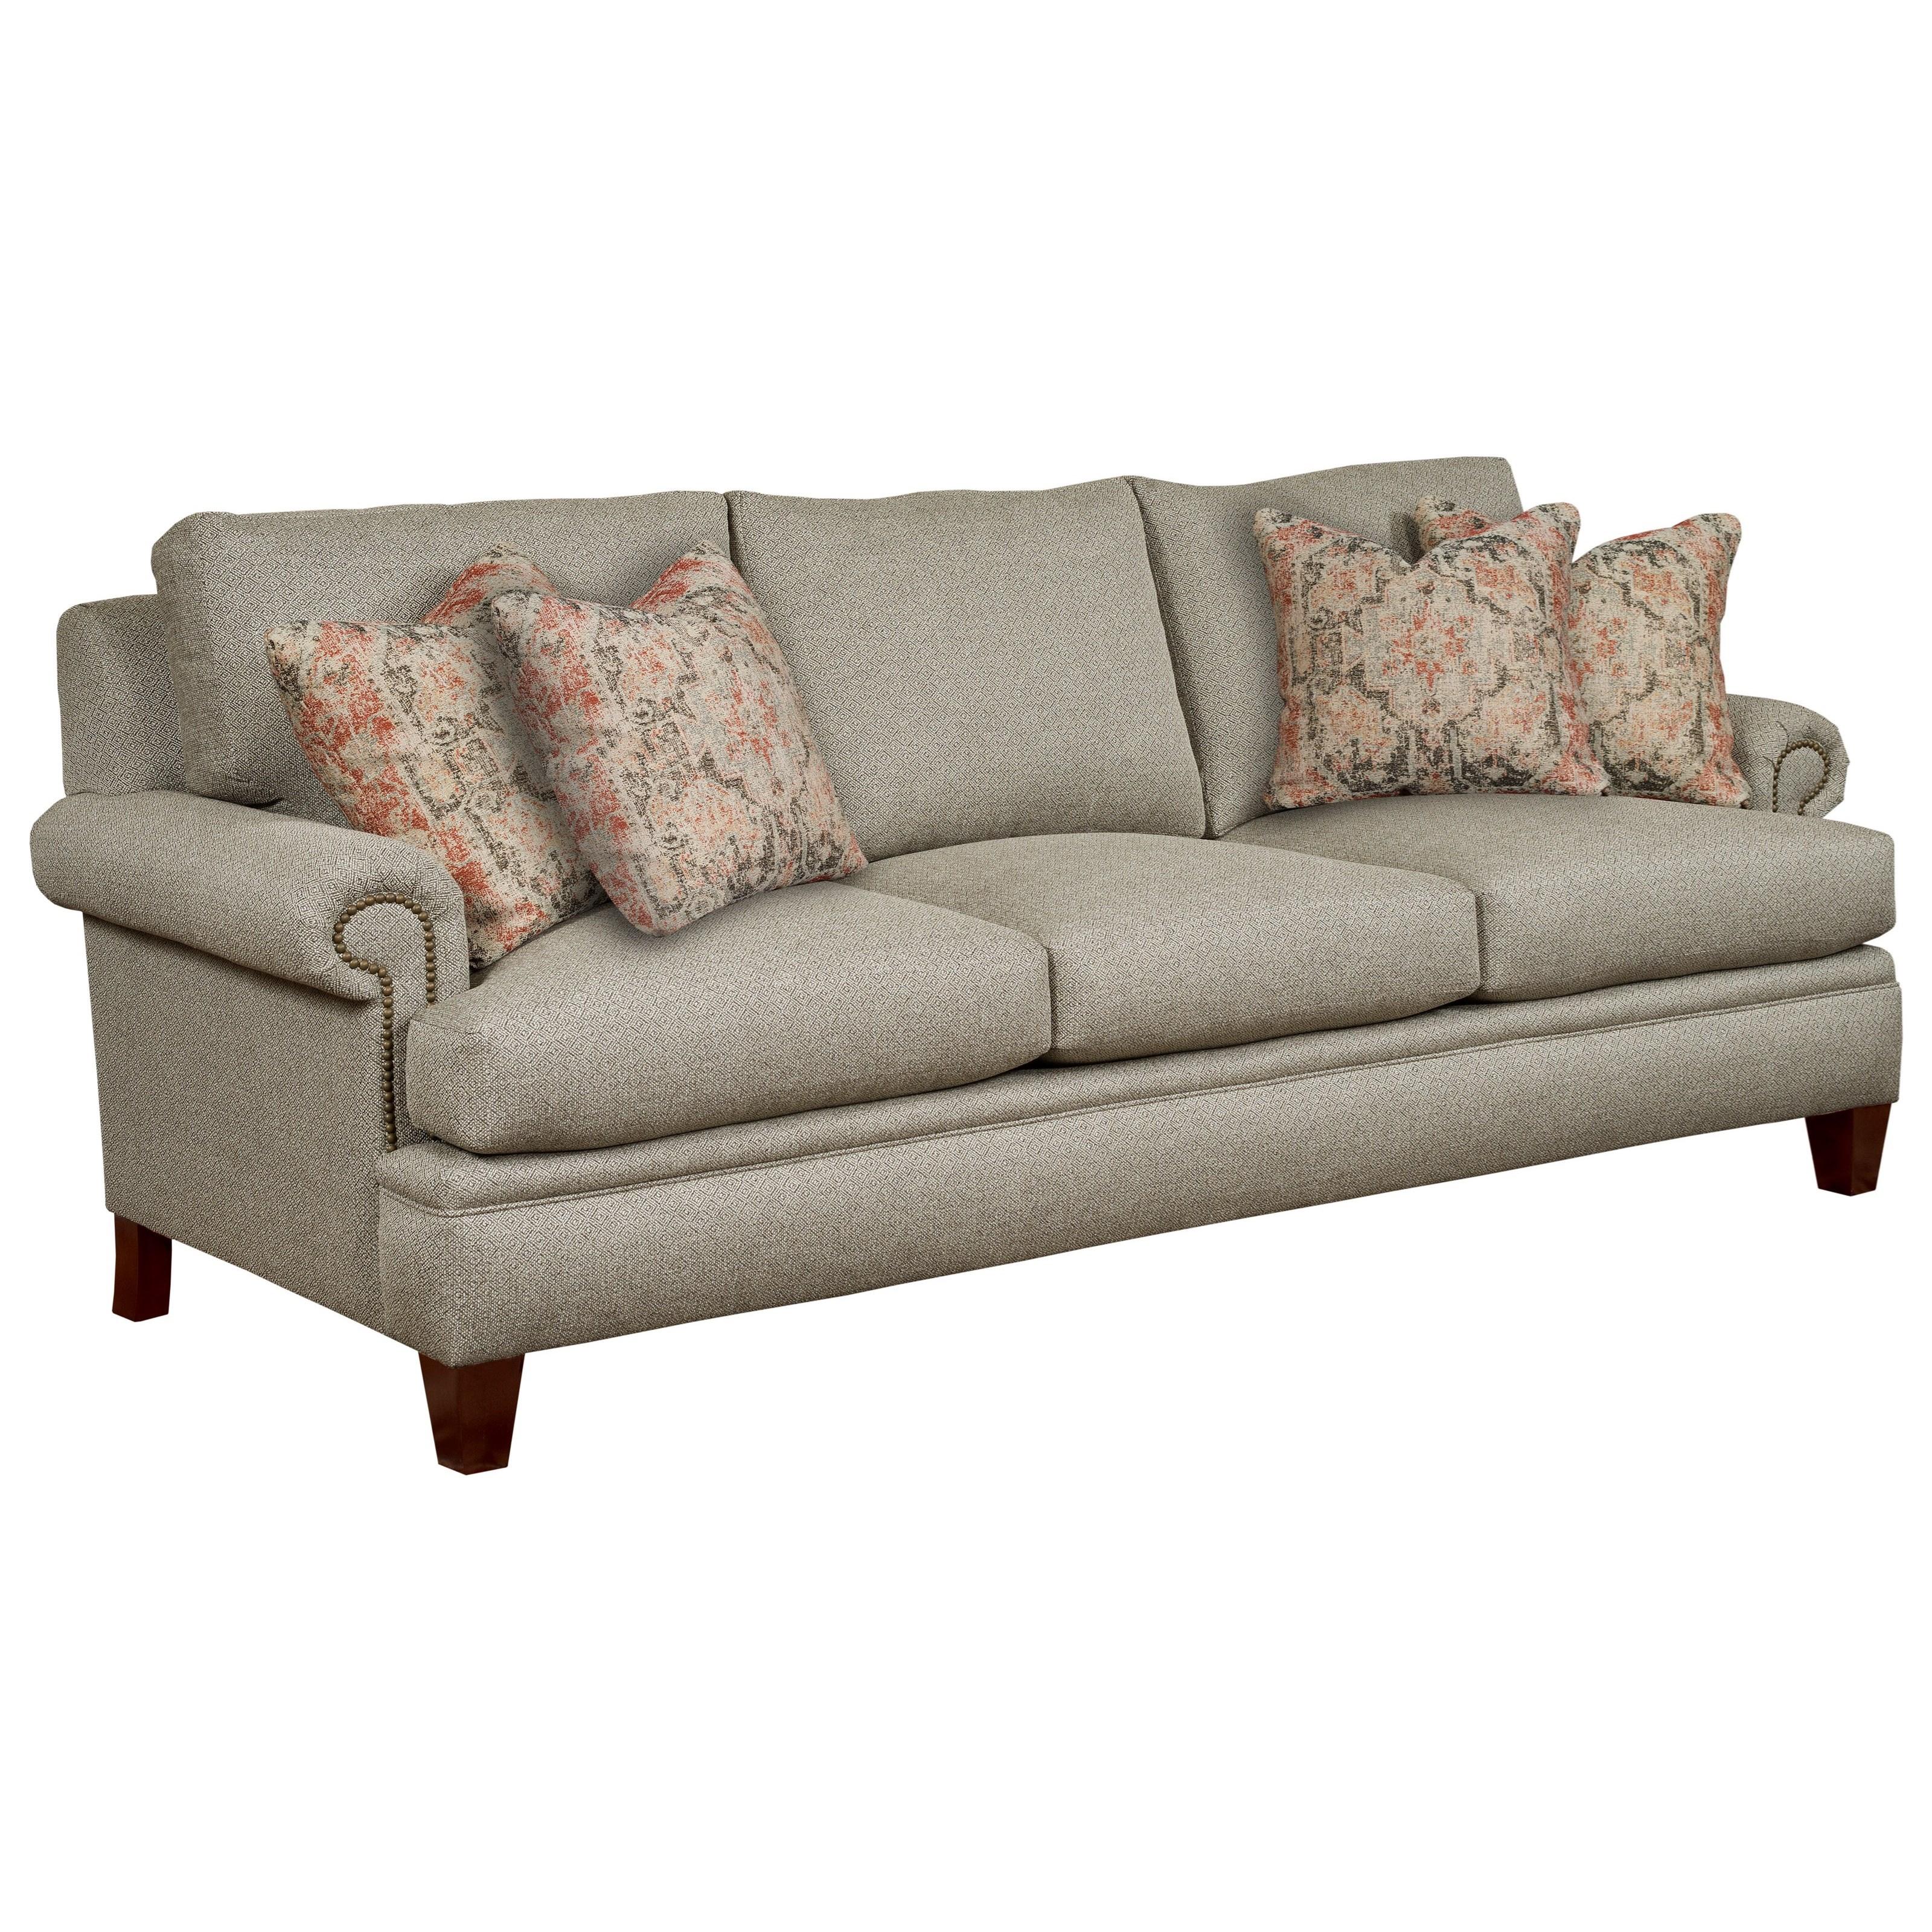 Ridgeline Sofa by Kincaid Furniture at Johnny Janosik